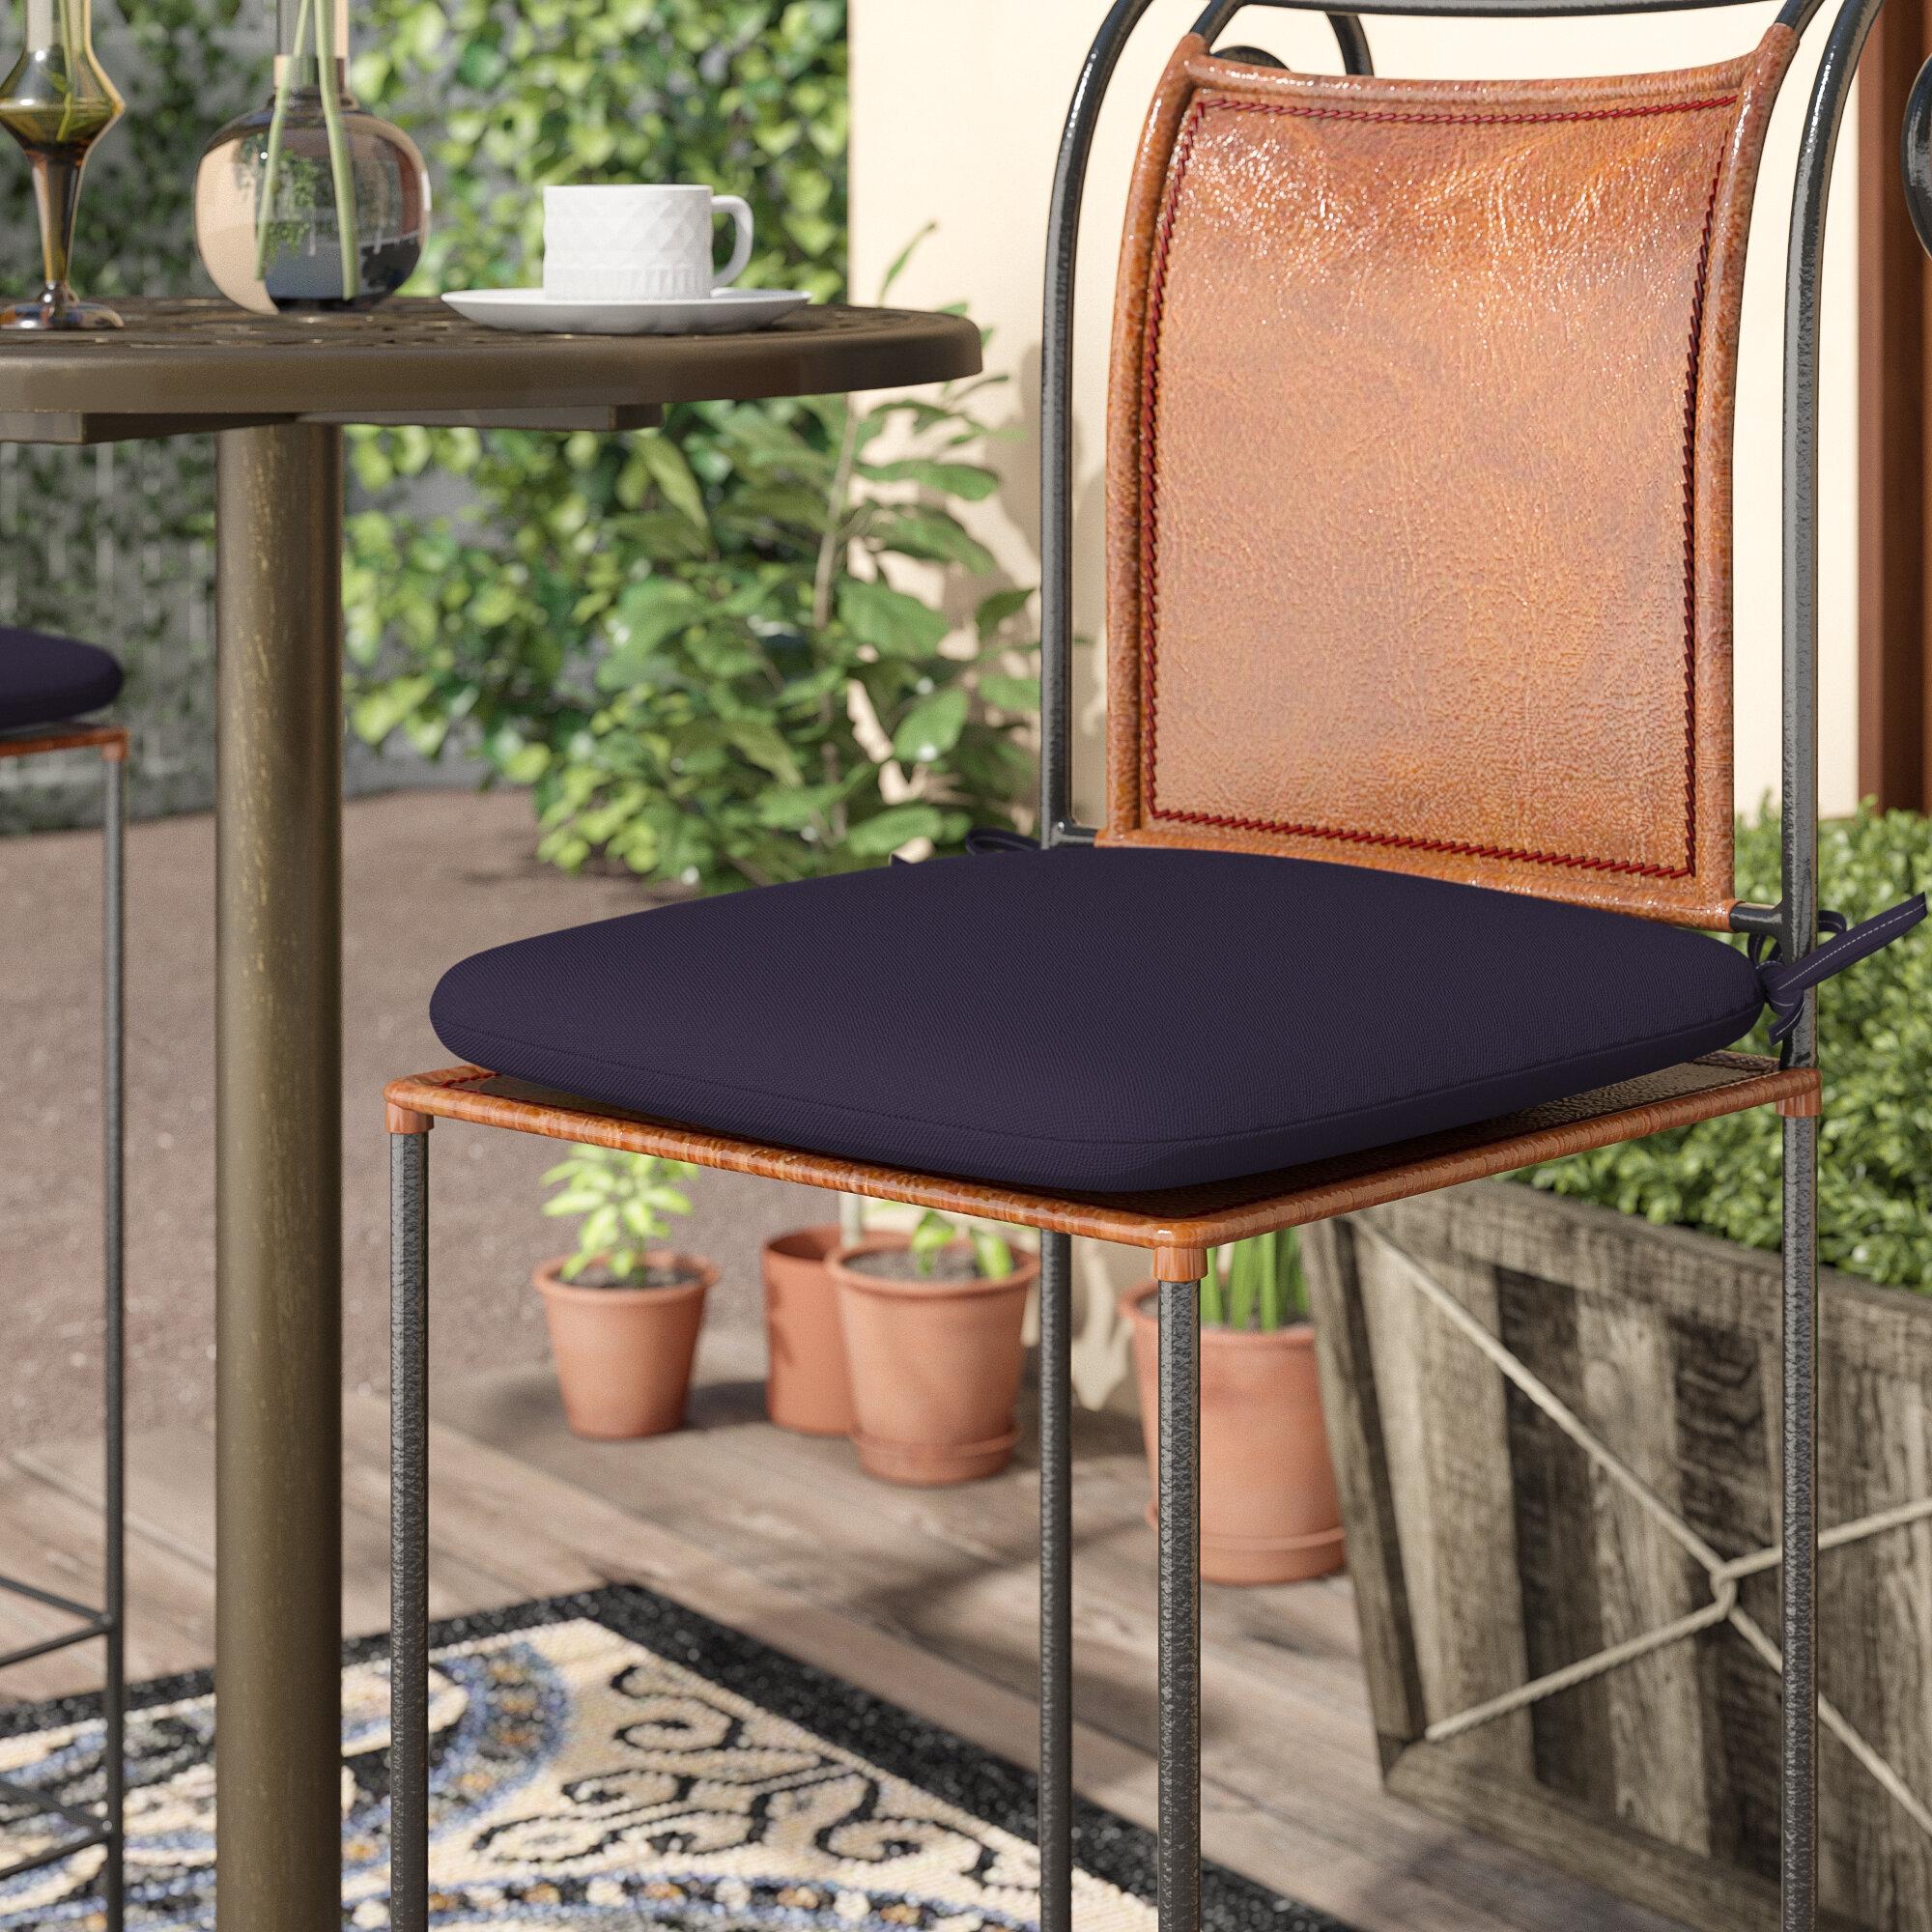 Barstool Charlton Home Chair Seat Cushions You Ll Love In 2021 Wayfair